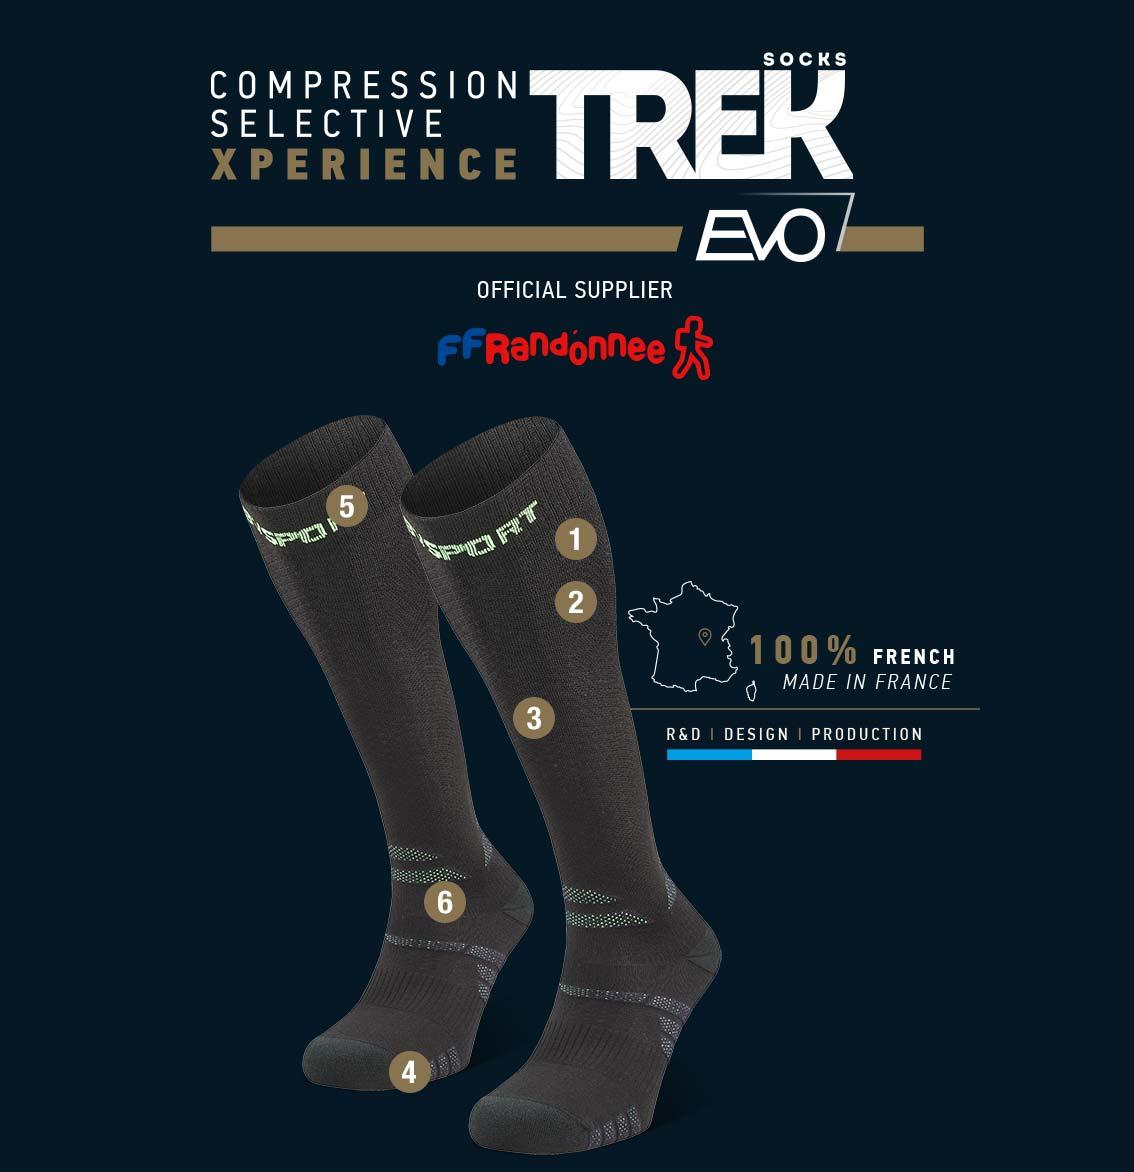 Hiking_socks_Trek_compression_EVO_black-green